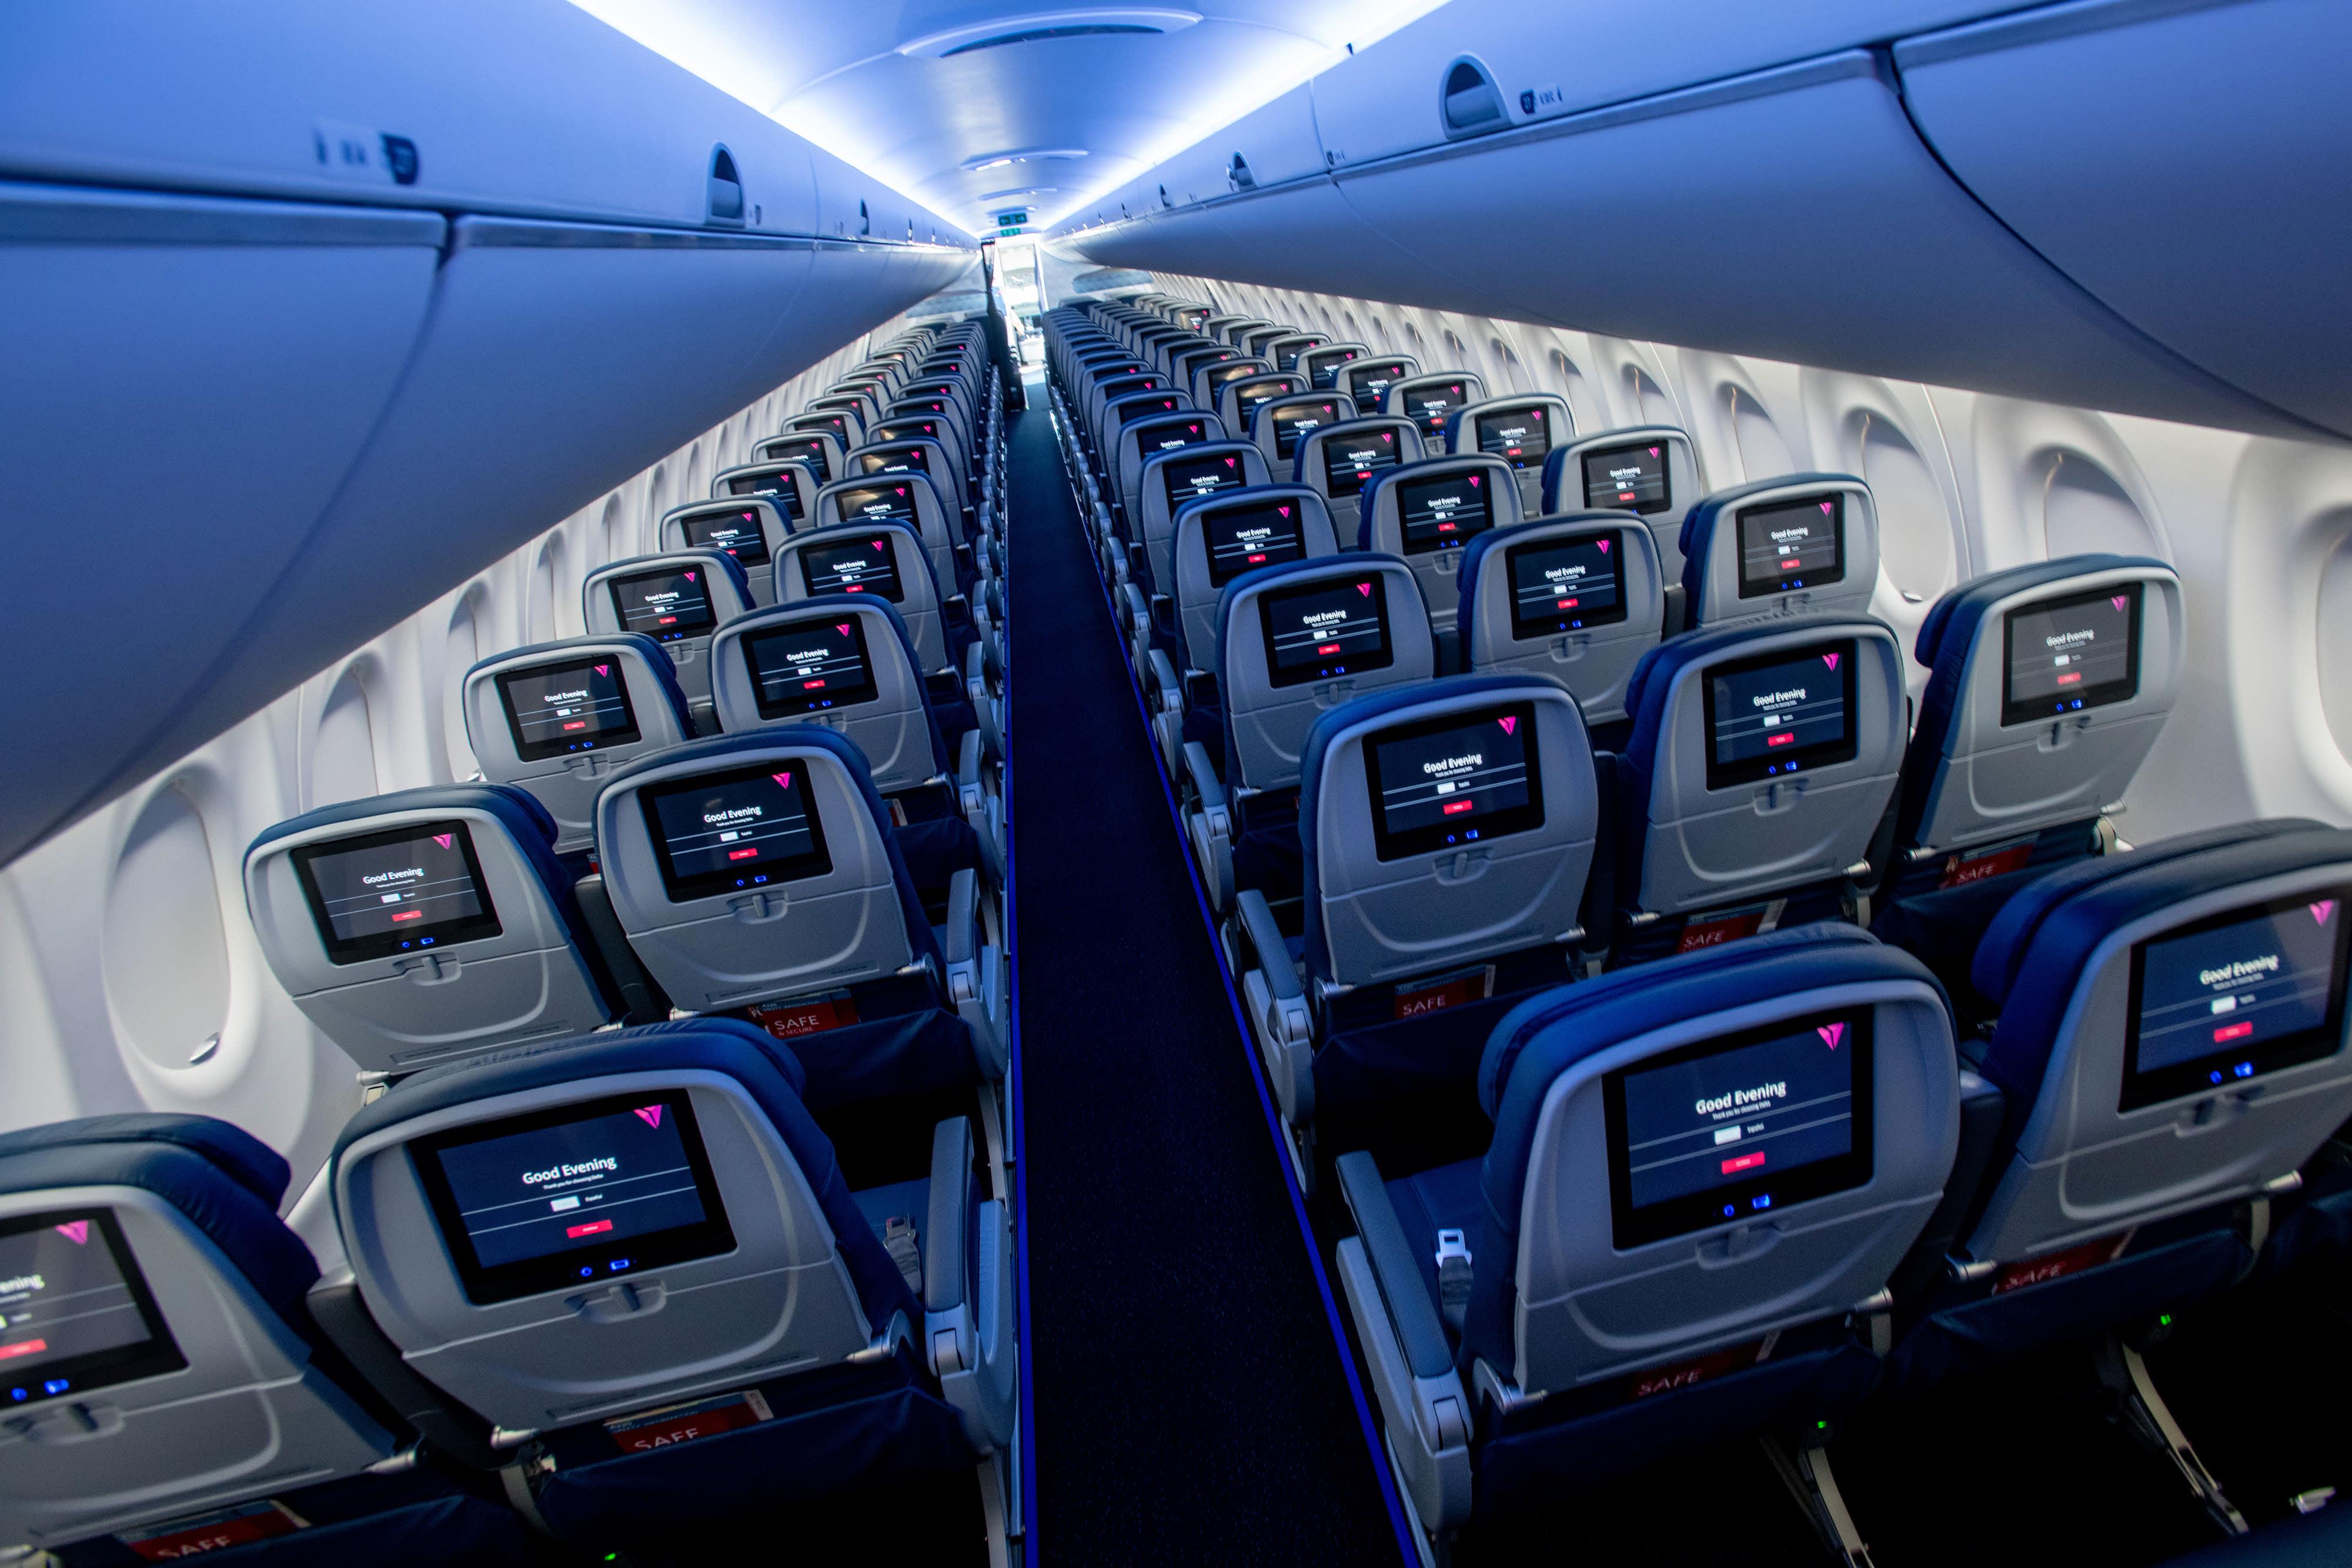 Marvelous Delta Air Lines Quiet Fuel Efficient A220 Planes Finally Uwap Interior Chair Design Uwaporg